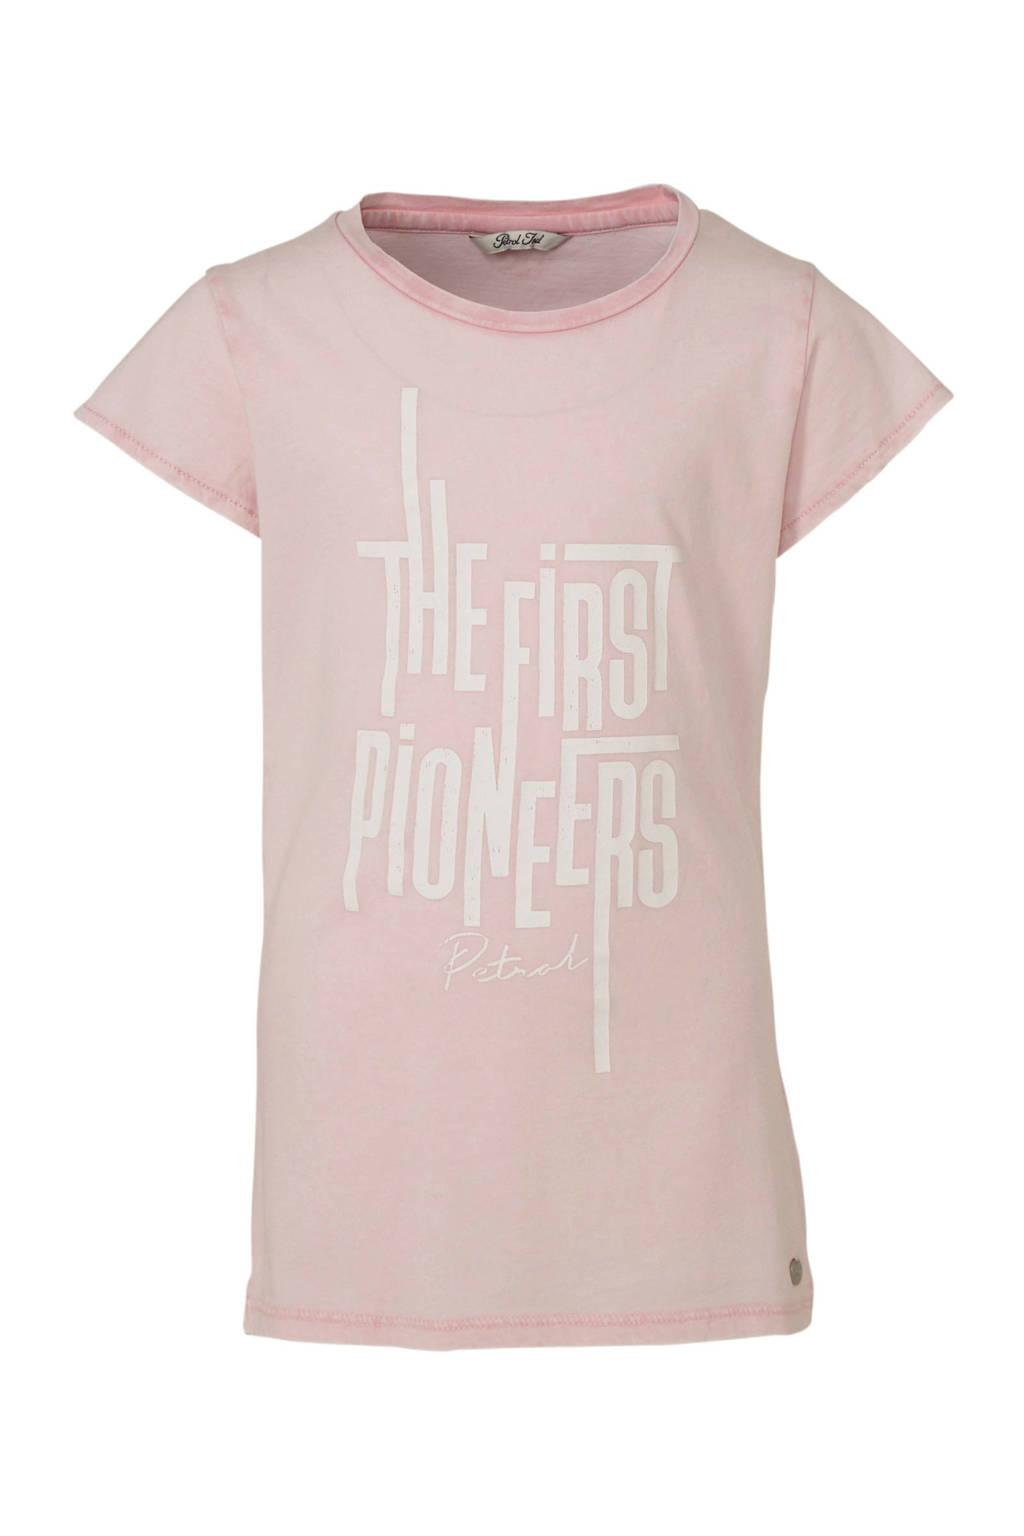 Petrol Industries T-shirt met printopdruk lichtroze/wit, Lichtroze/wit